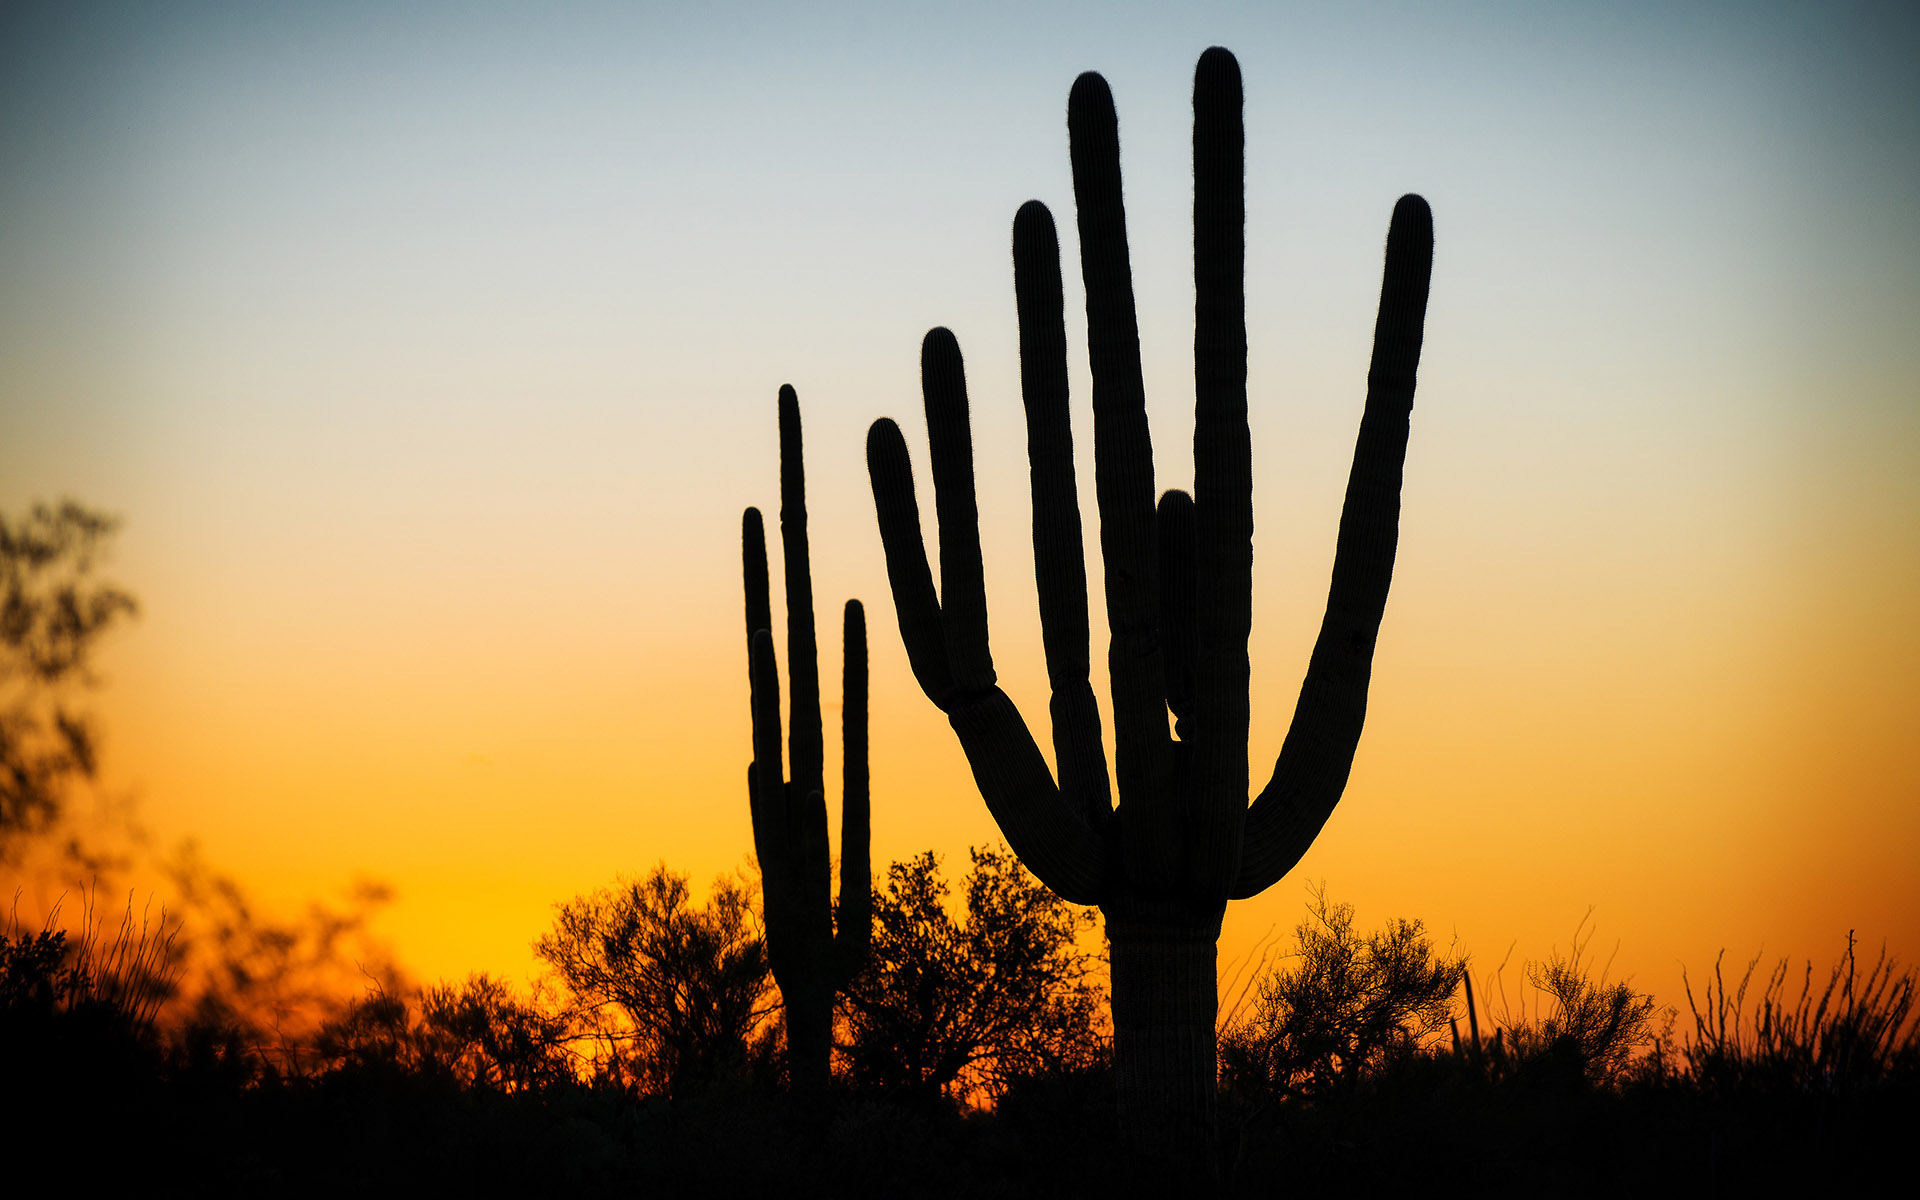 141010_TucsonAZ_PHP_1447WEB.jpg